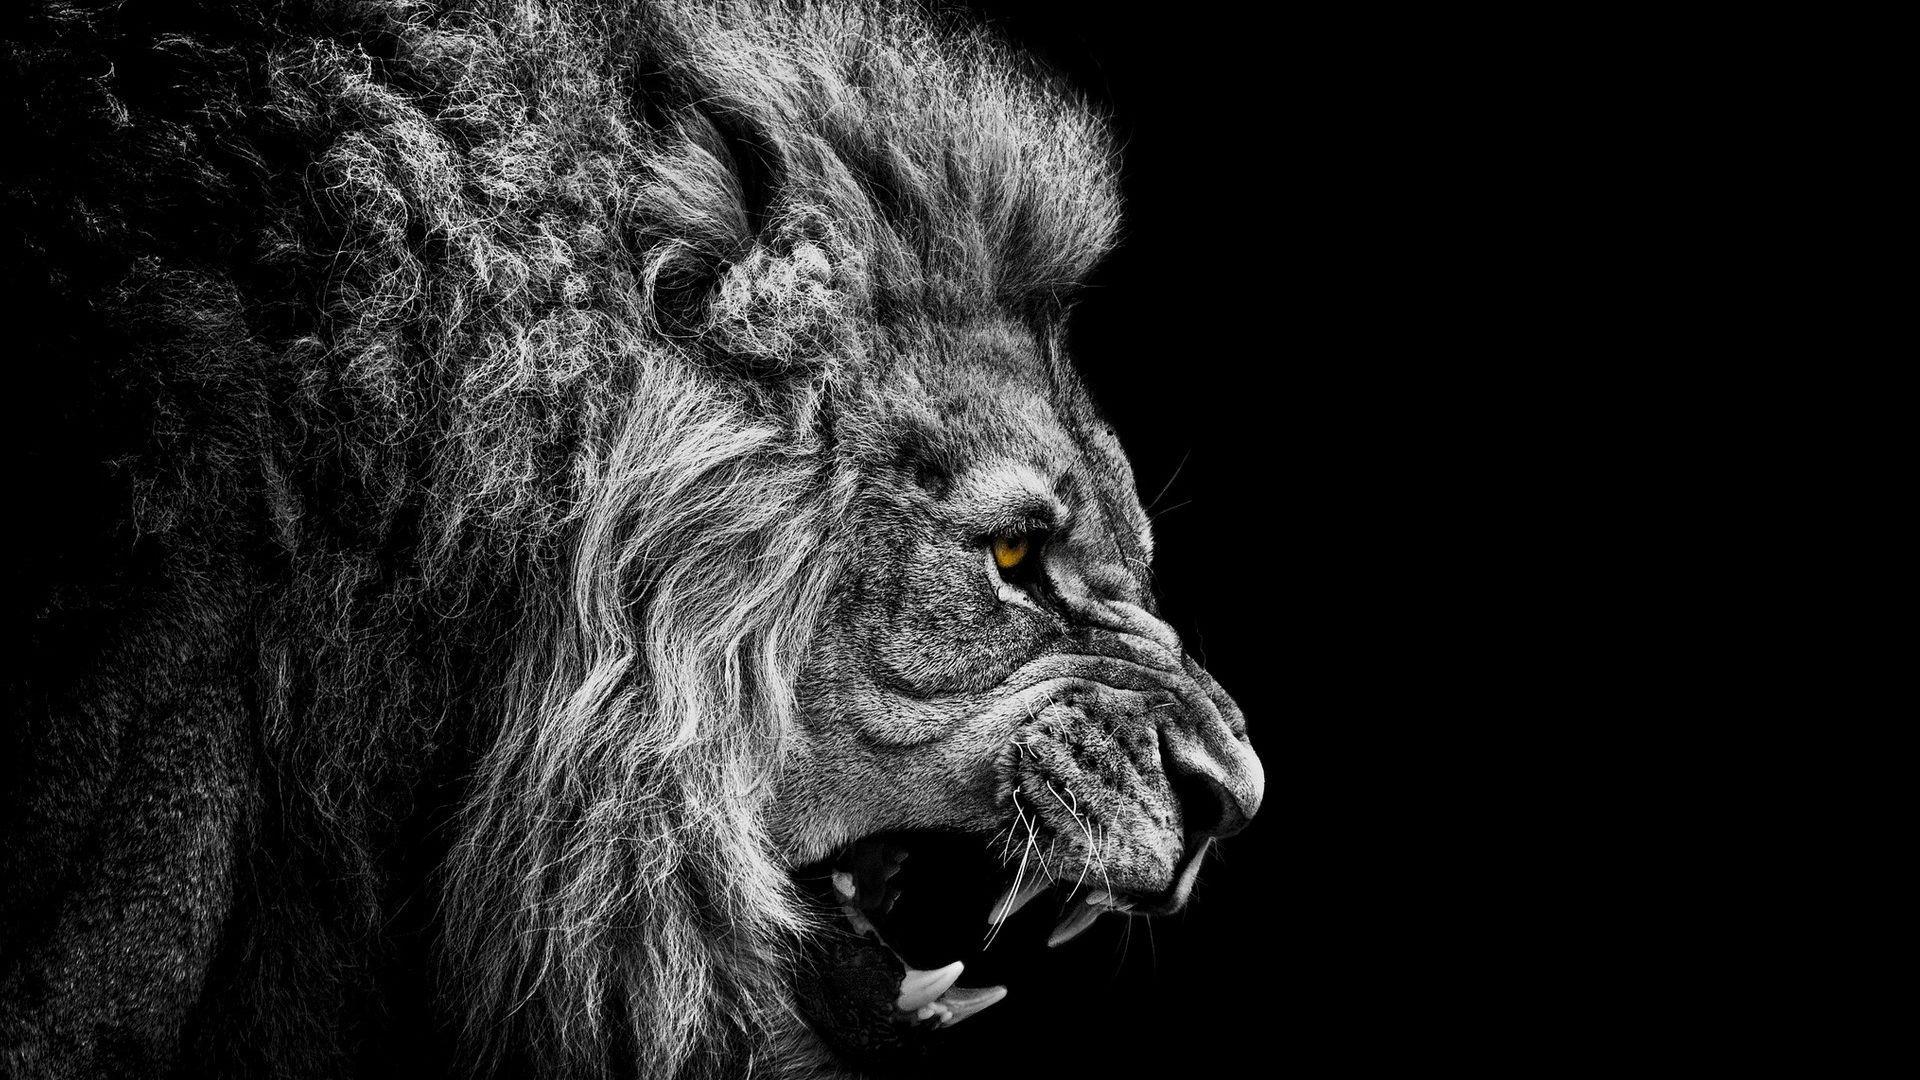 Lion Wallpaper 4   Resolution19201200 1920x1080